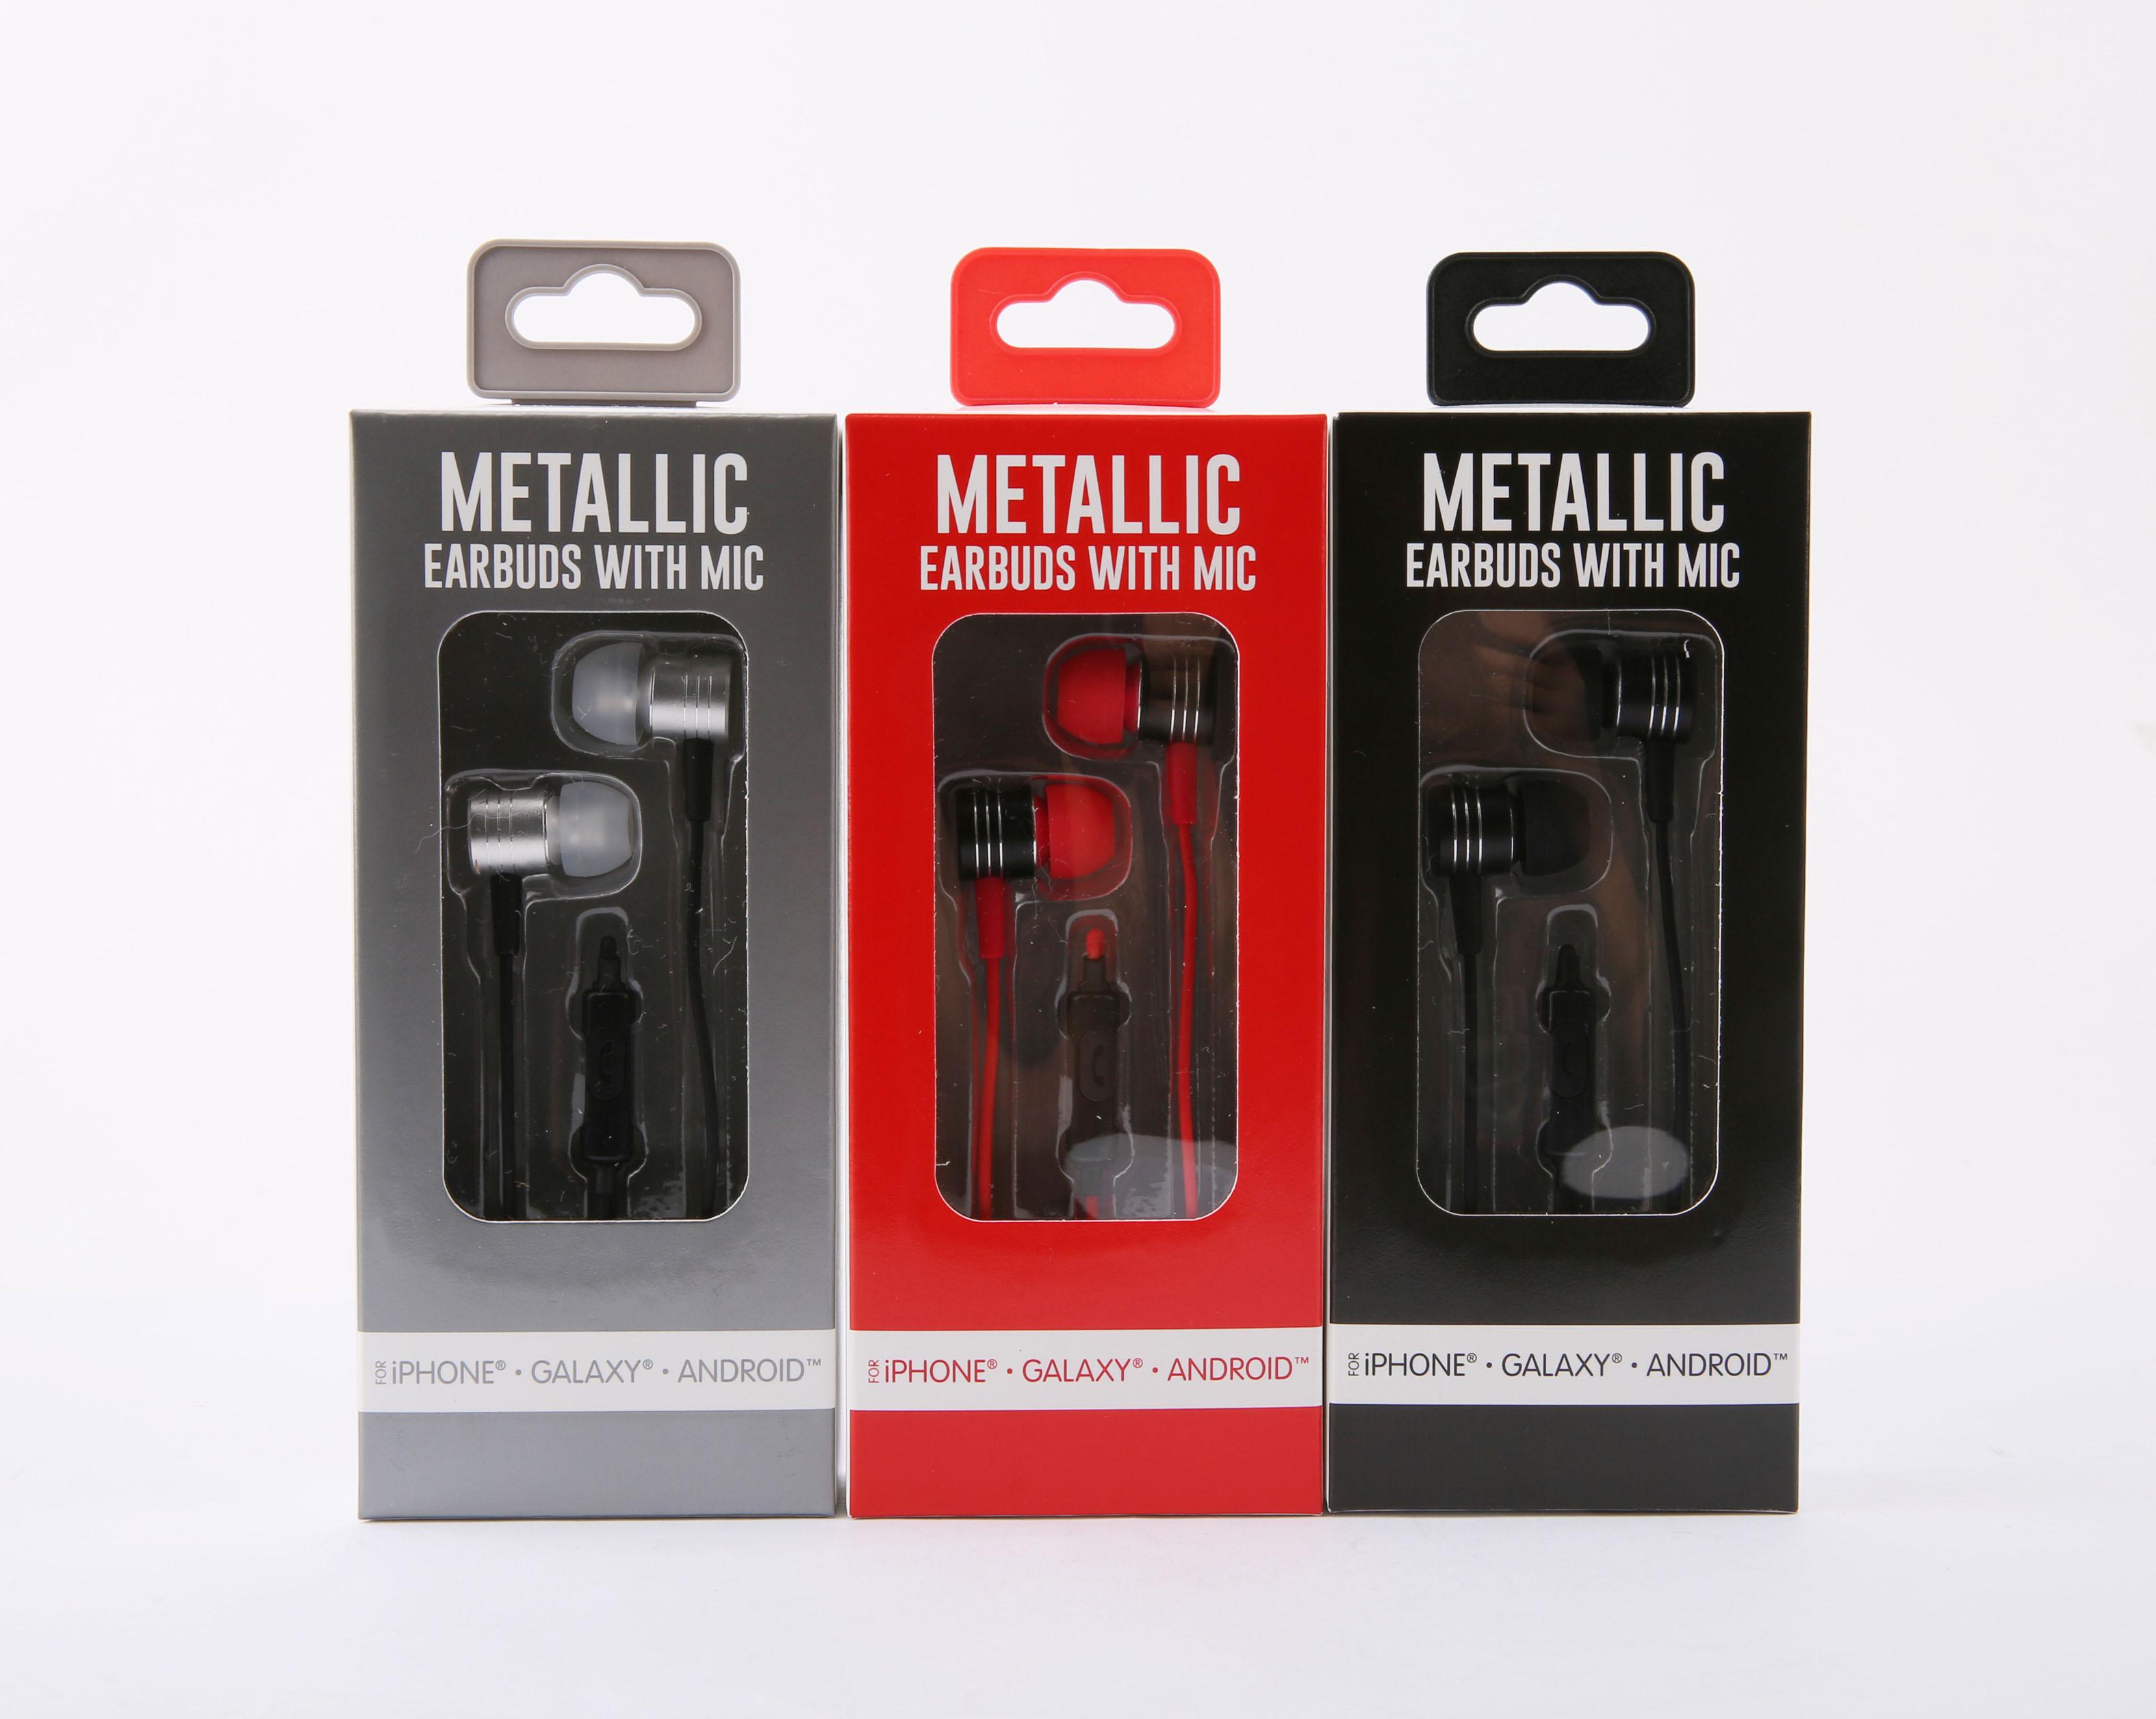 dfb6eef4d4c General Metallic Earbud W/mic Black - Walmart.com